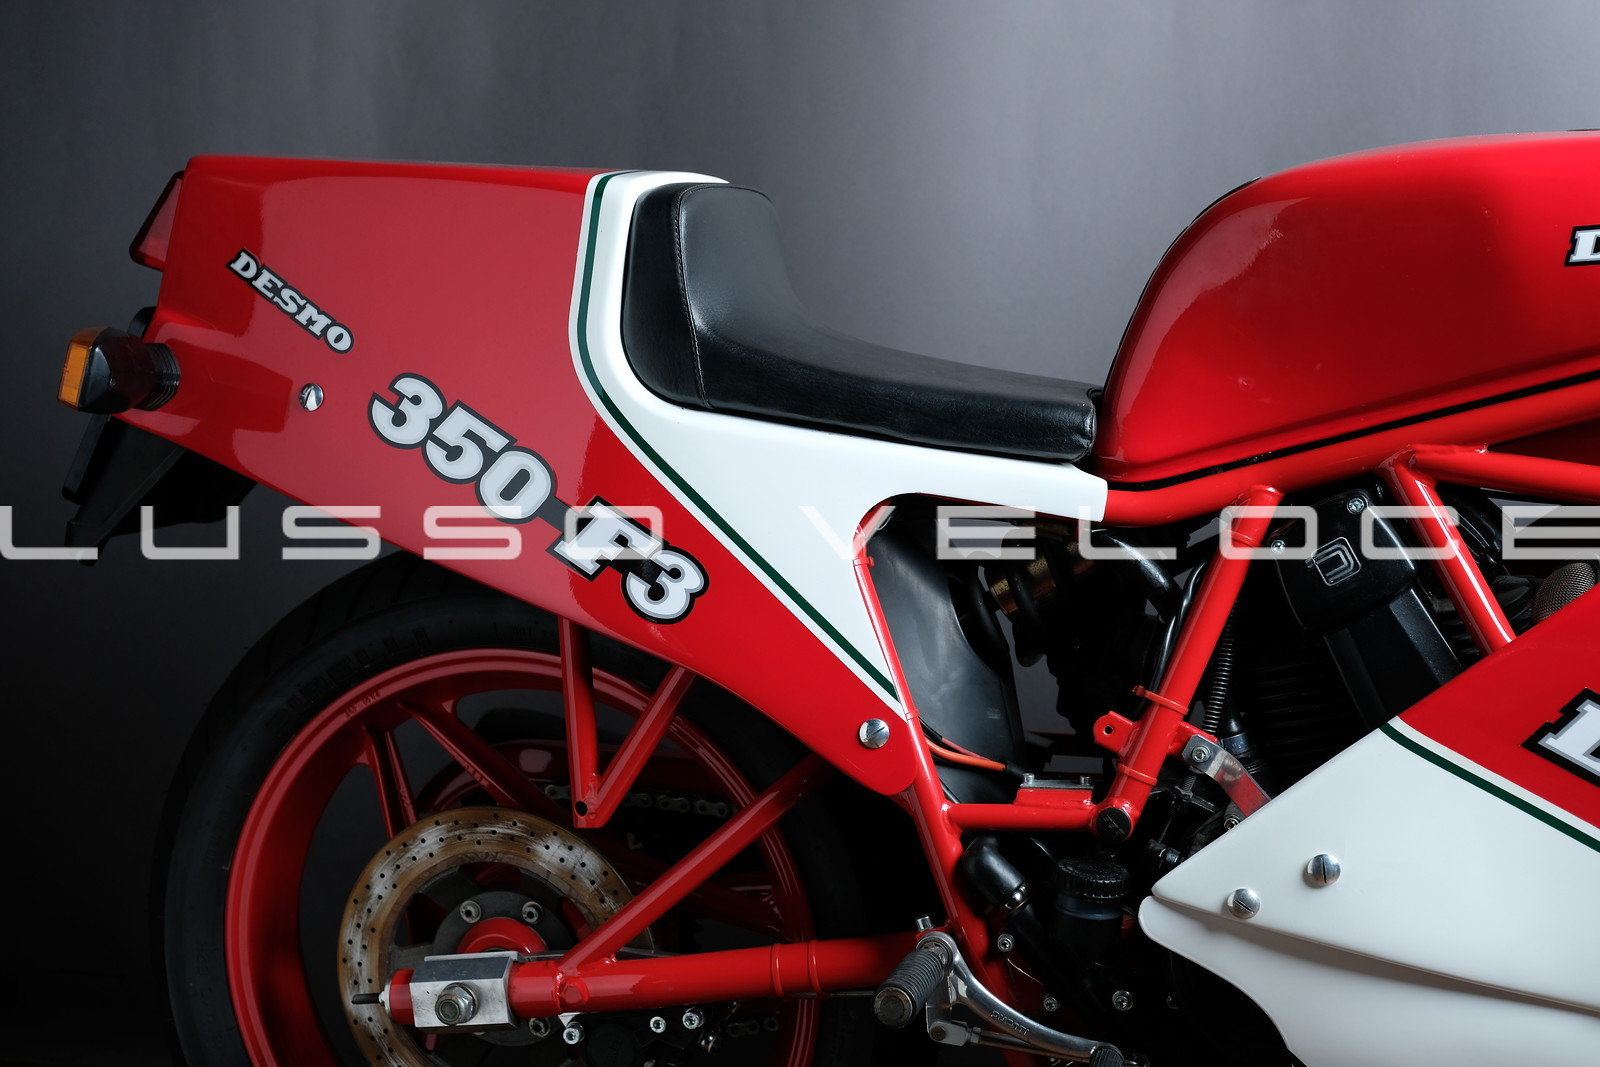 1986 Rare Ducati F3 350 fully restored For Sale (picture 3 of 15)